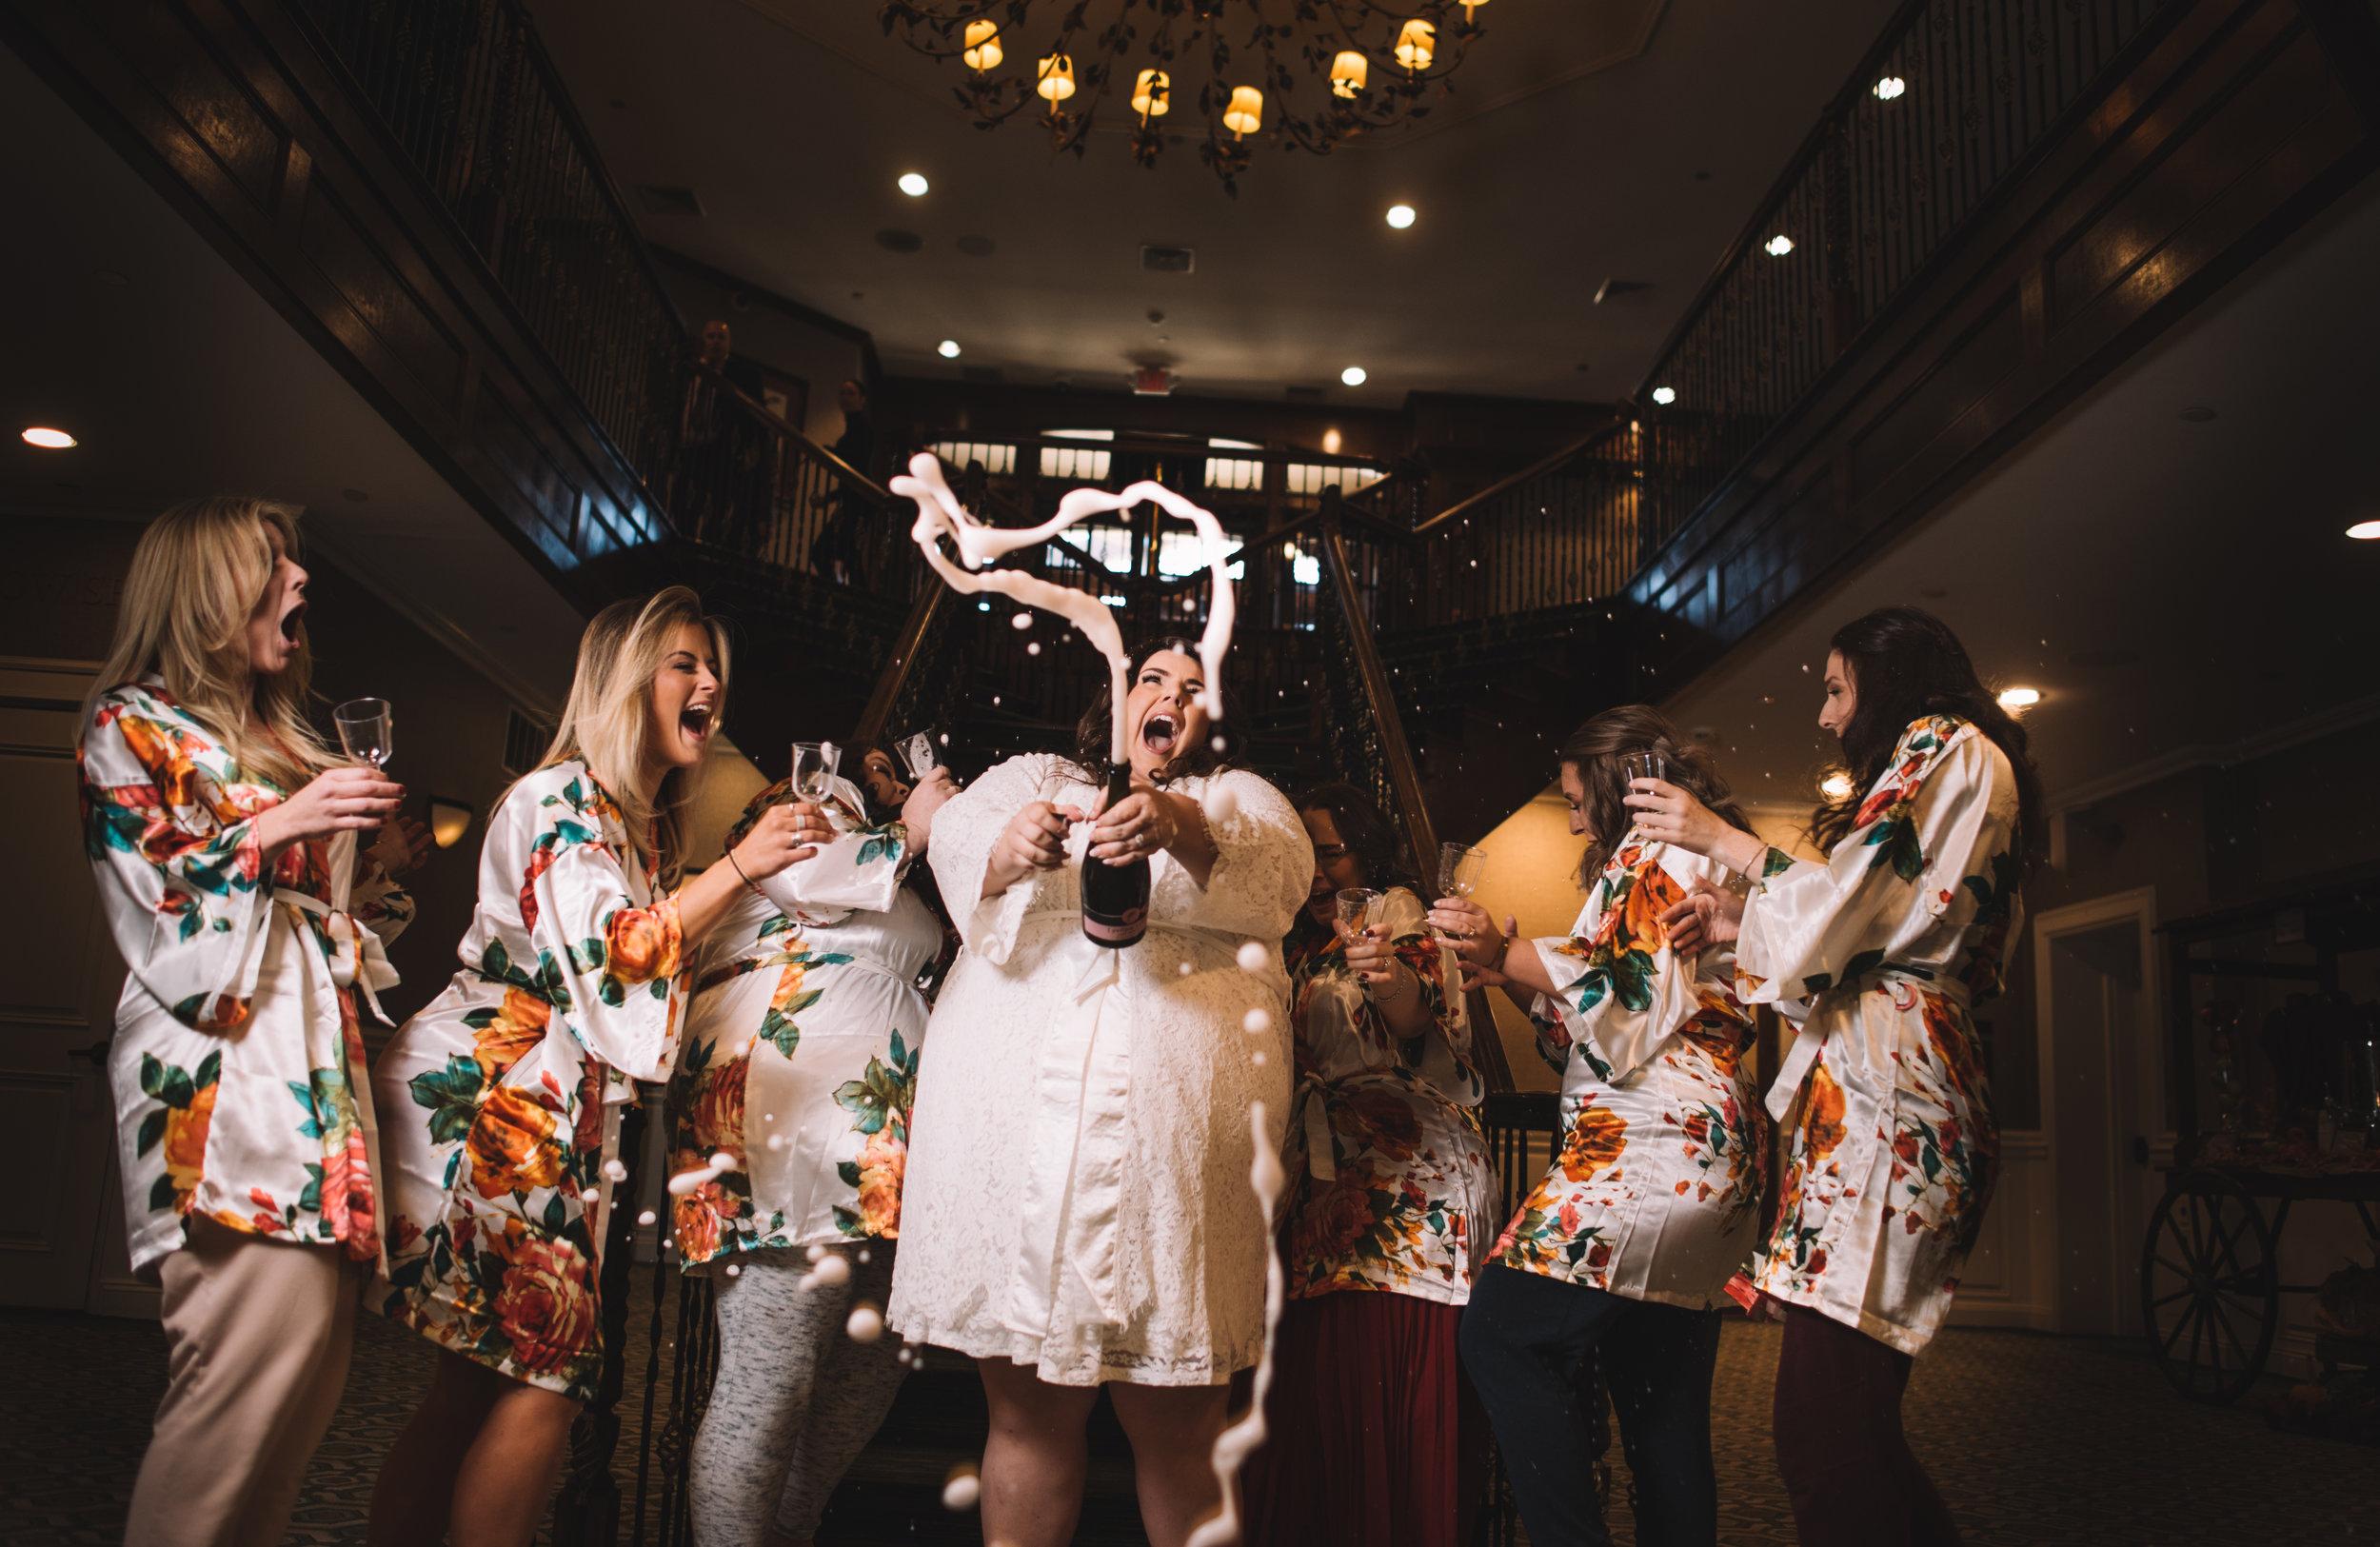 WeddingPhotos | NJPhotographer | Highlights-3-48.jpg